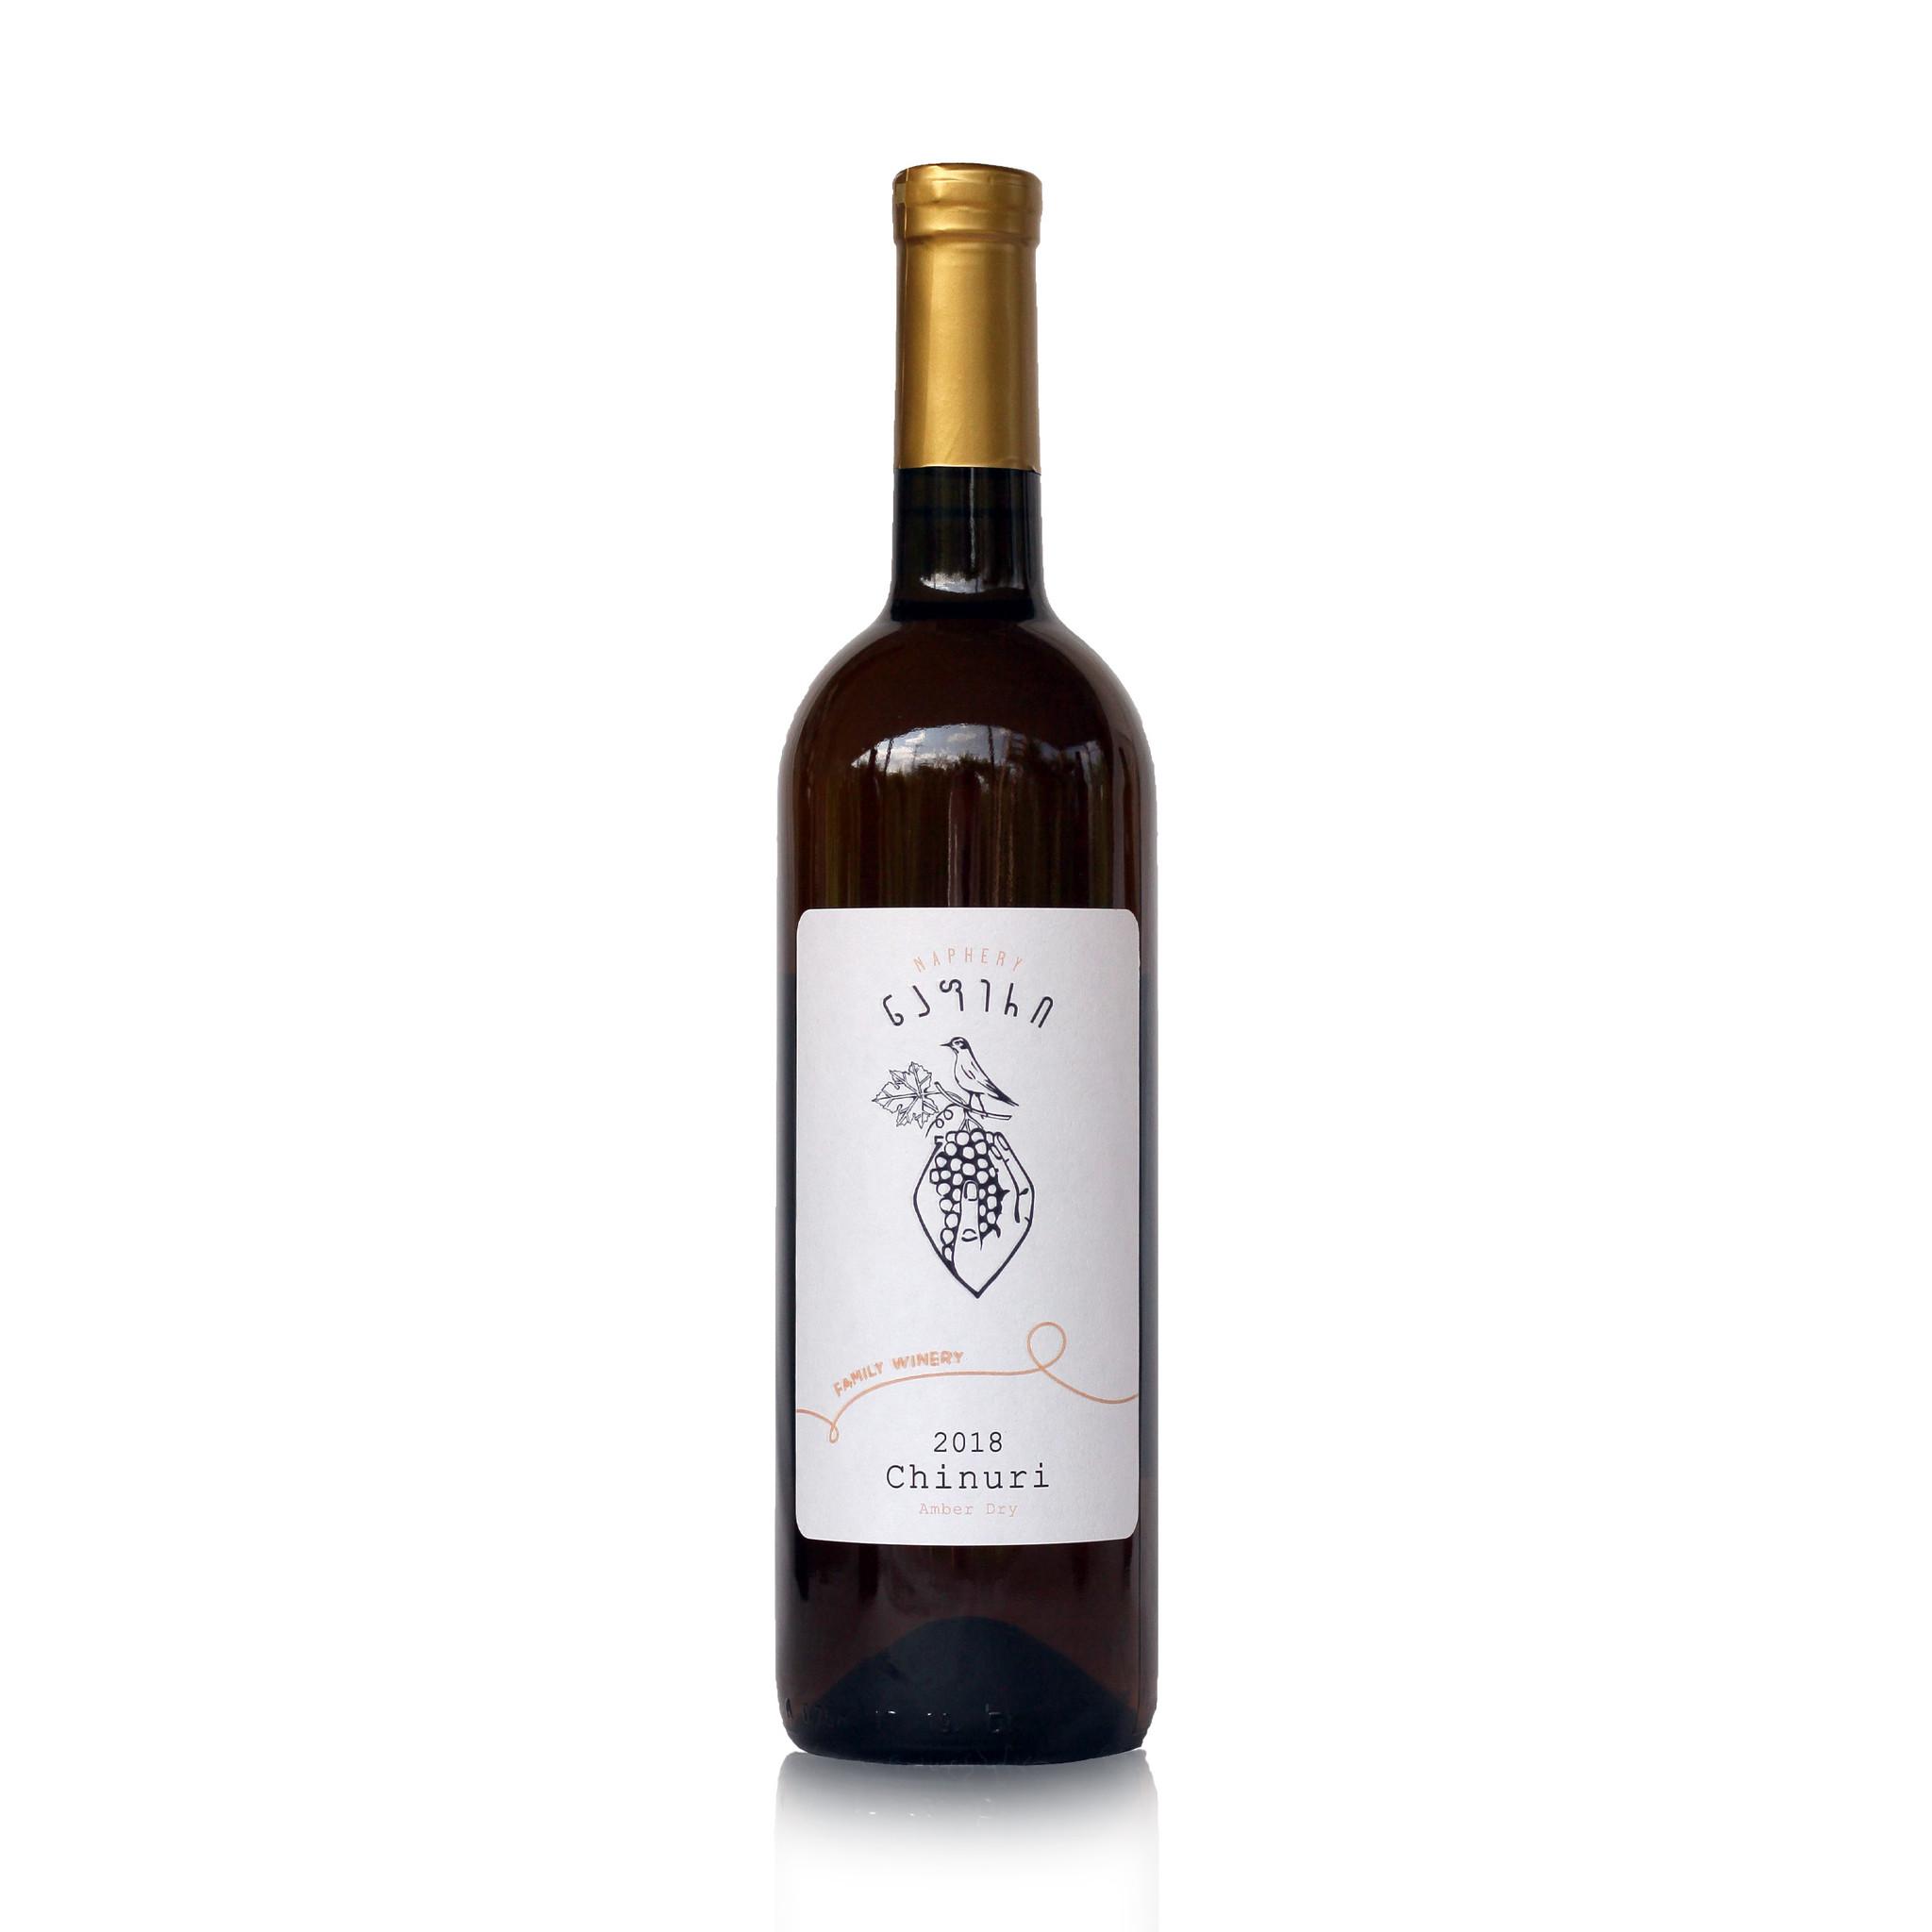 Napheri Napheri Chinuri 2018 Qvevri Amber wine